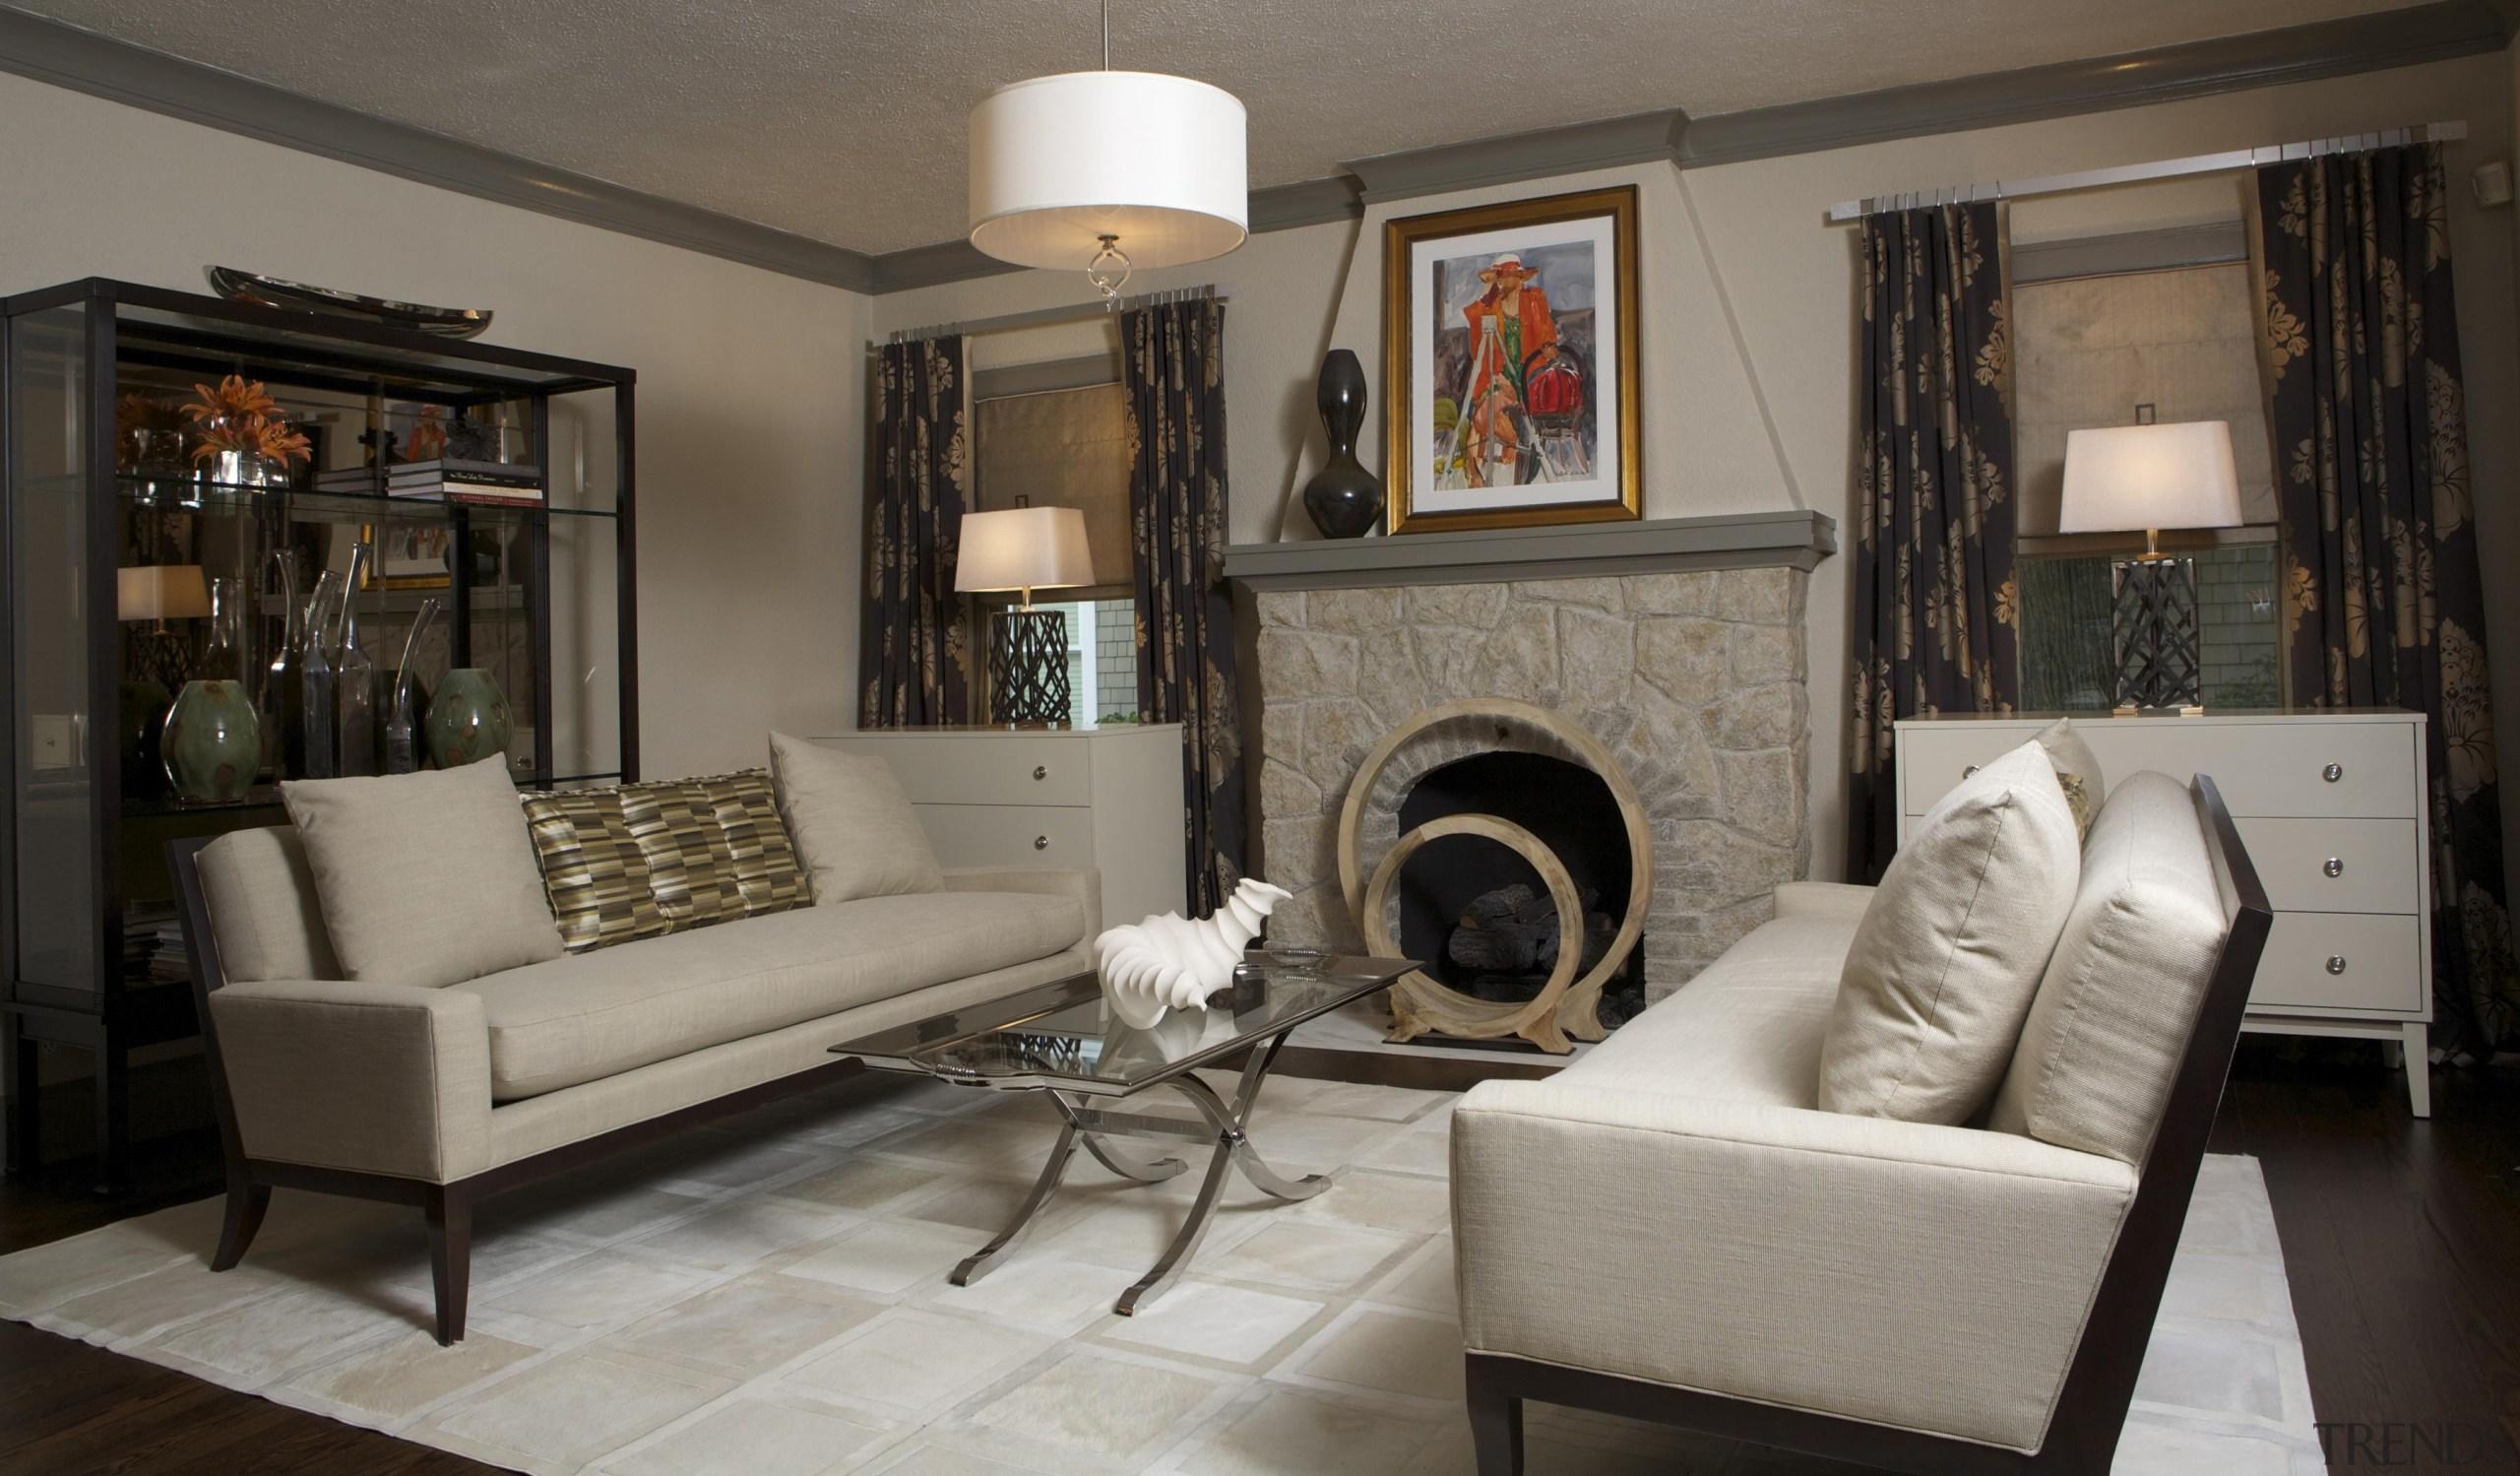 Historic Bungalow Renovation - Living Room - ceiling ceiling, floor, furniture, home, interior design, living room, property, room, wall, gray, black